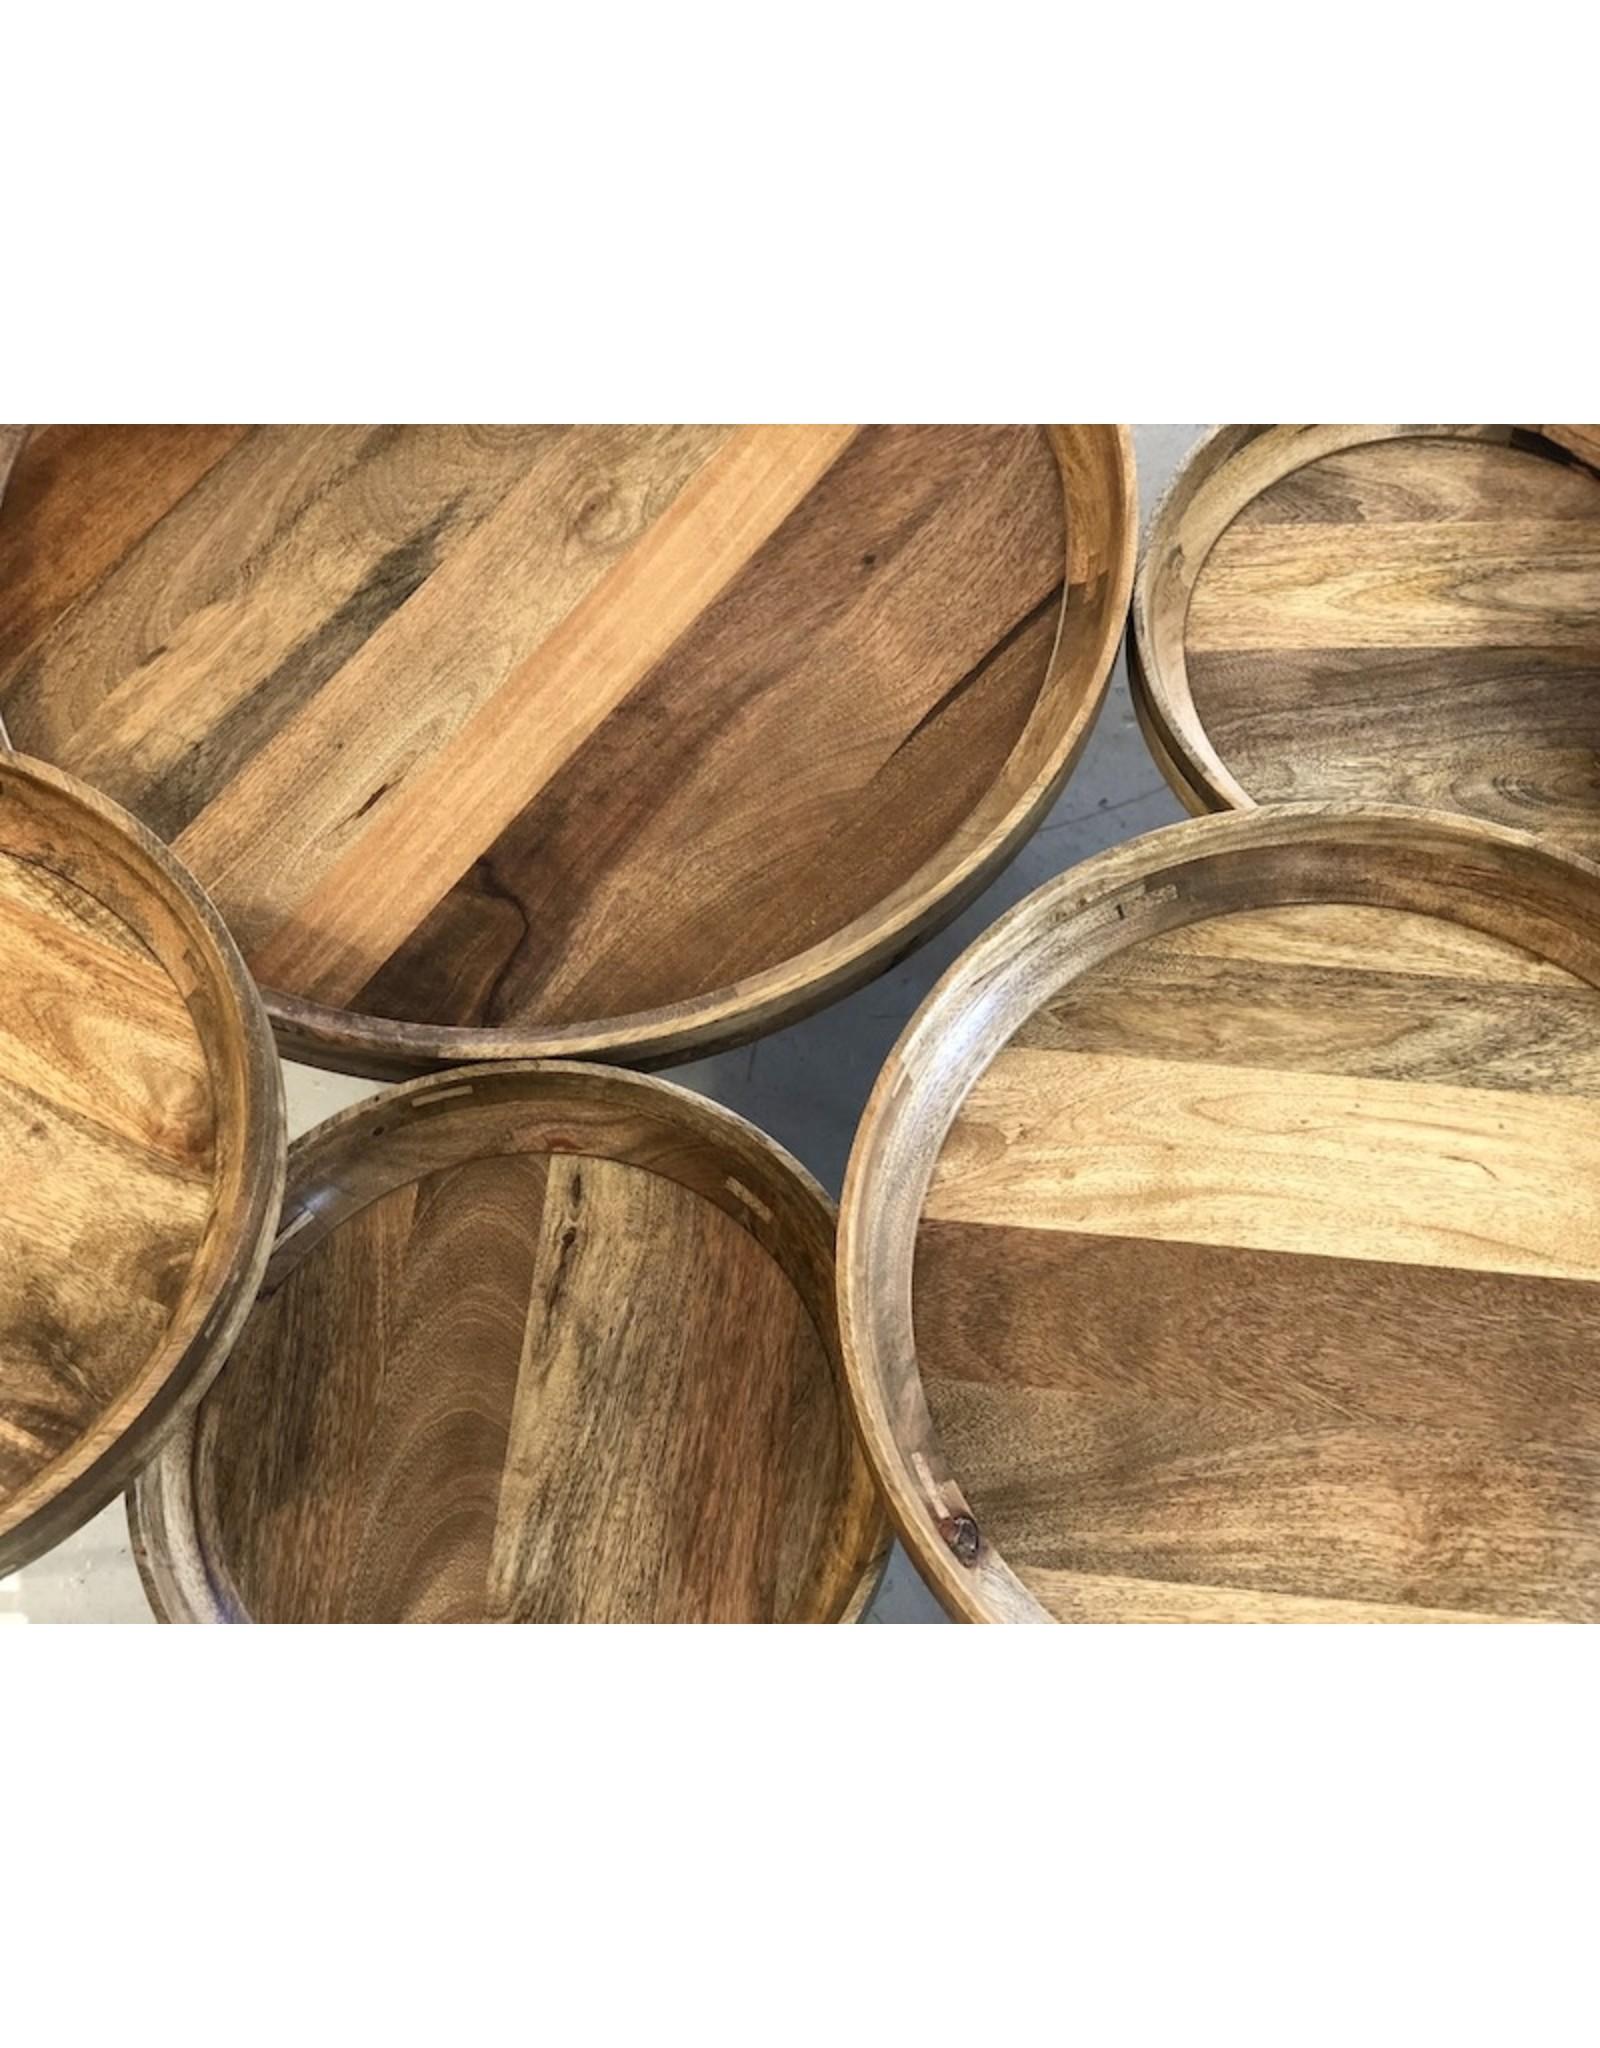 MANGO BOWL TABLE IN NATURAL MANGO WOOD FINISH